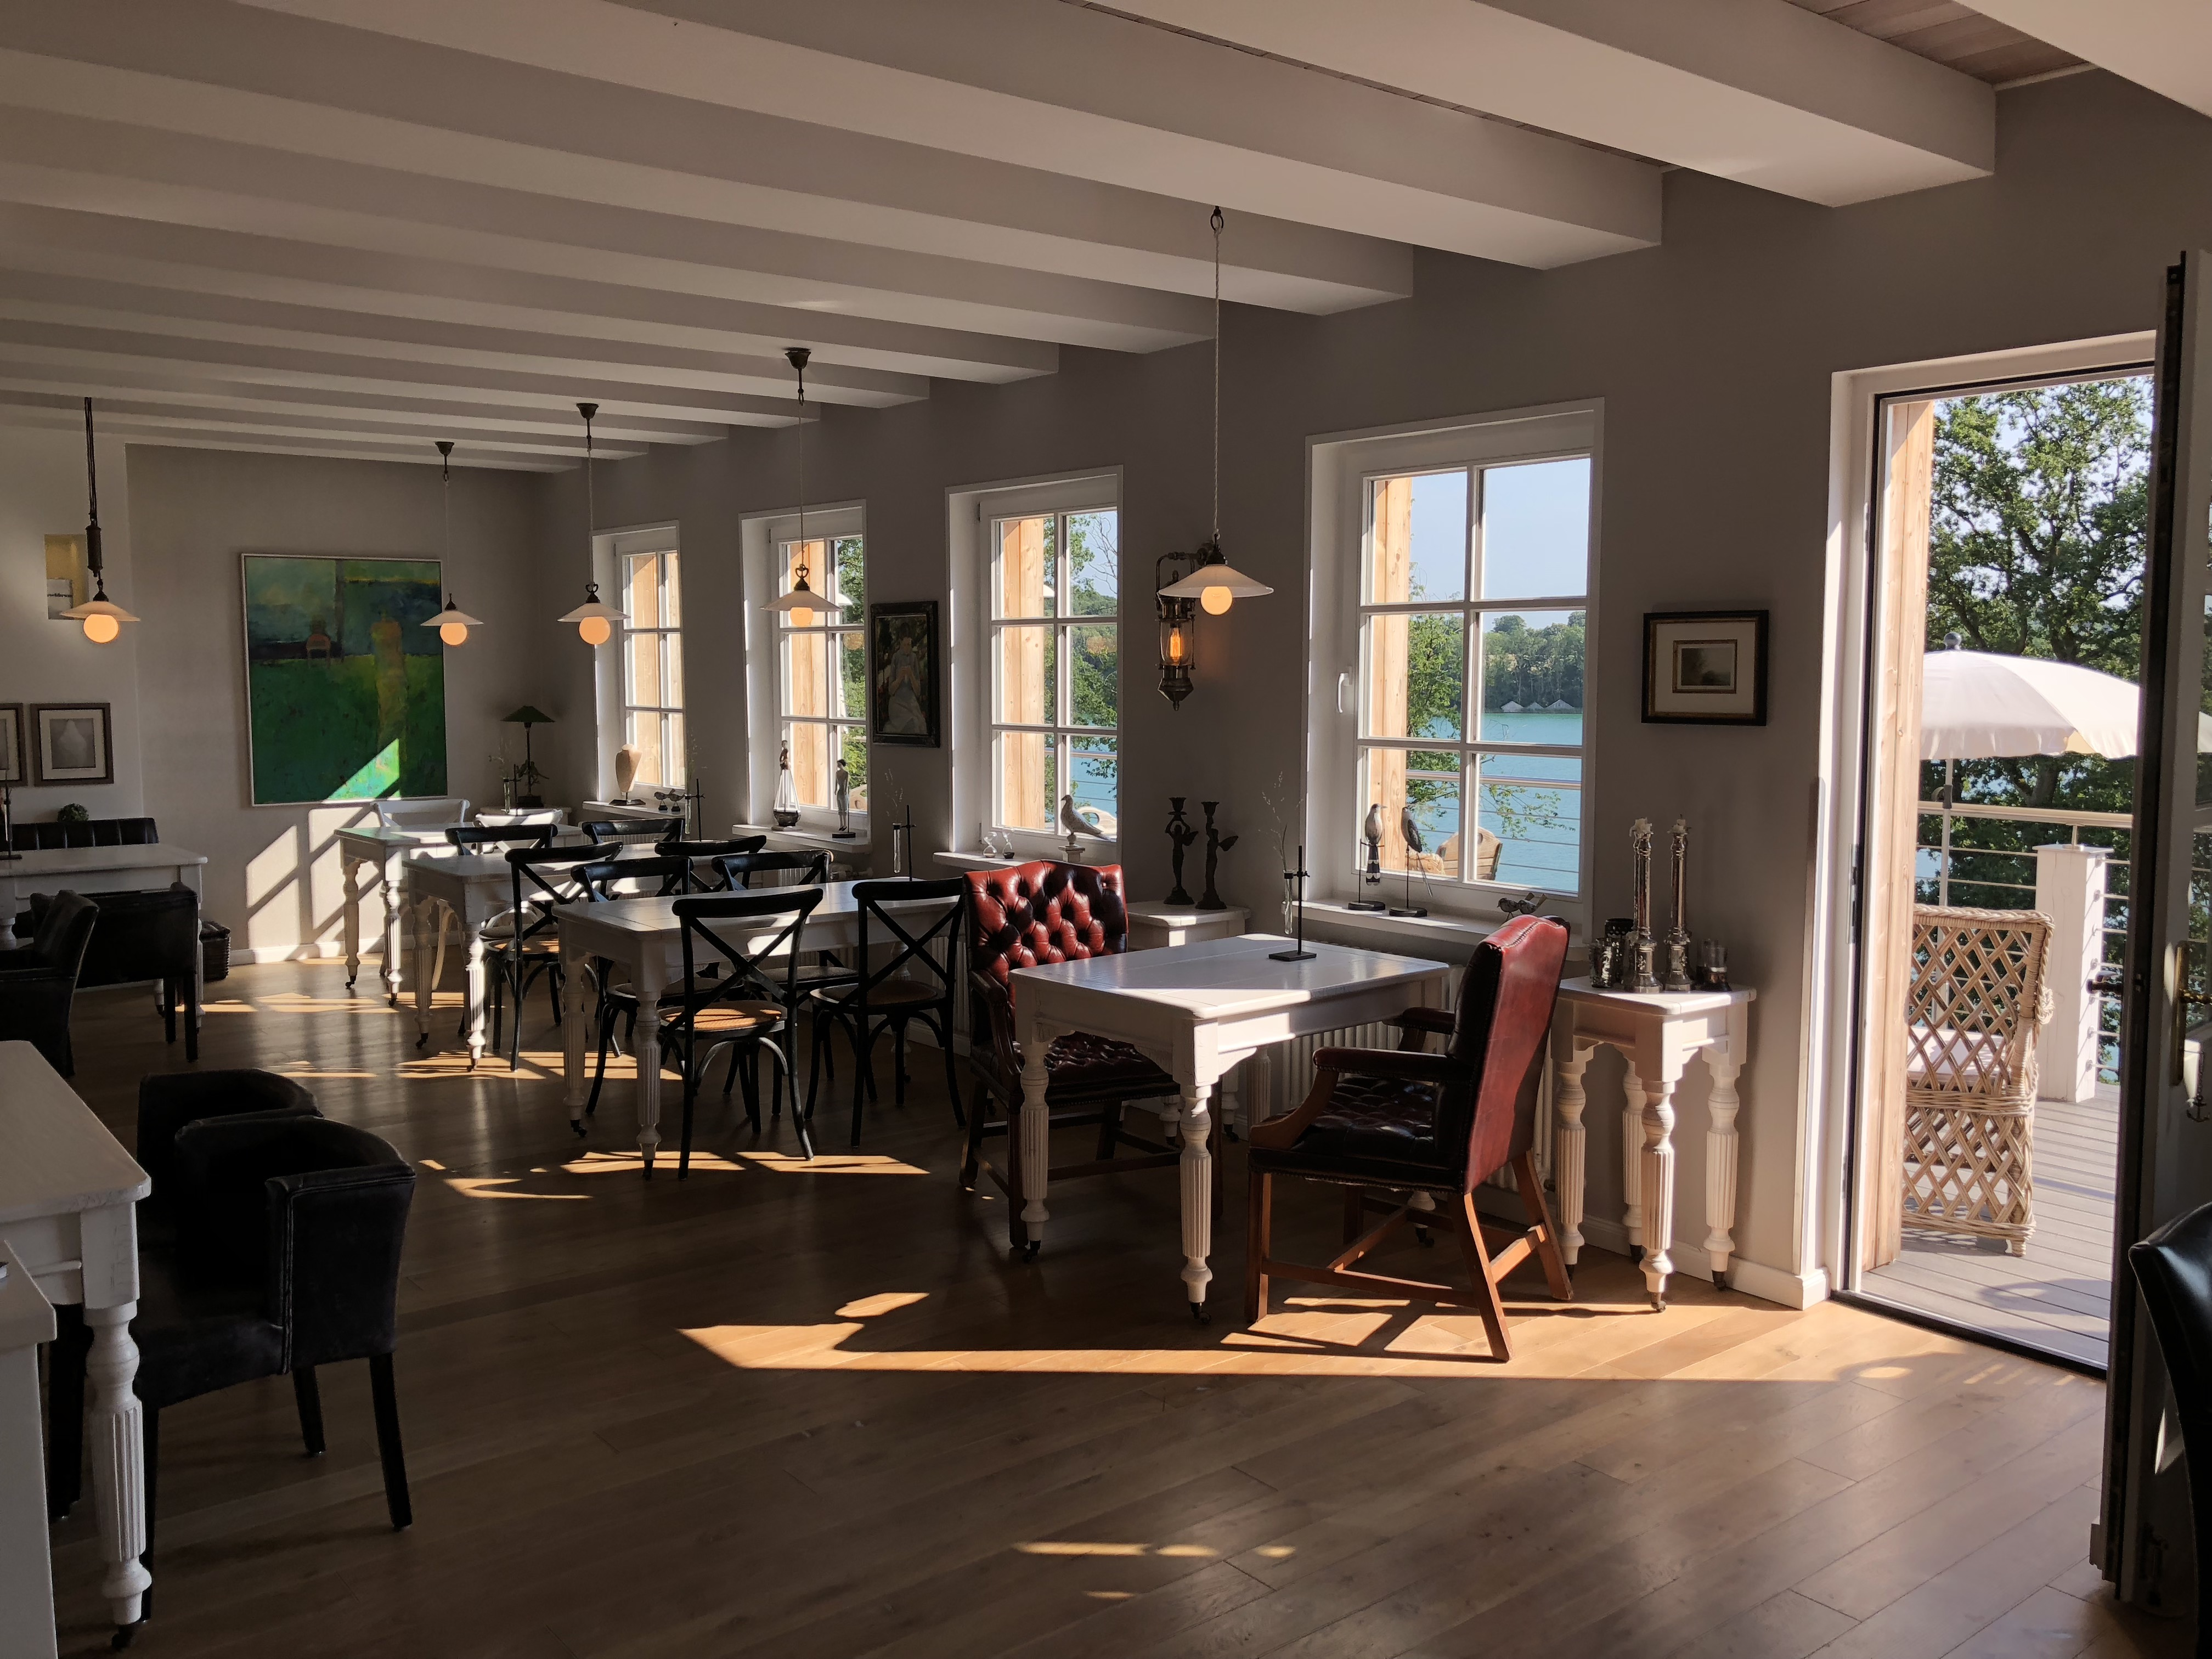 restaurant refugium in feldberg zimmer mit seeblick. Black Bedroom Furniture Sets. Home Design Ideas